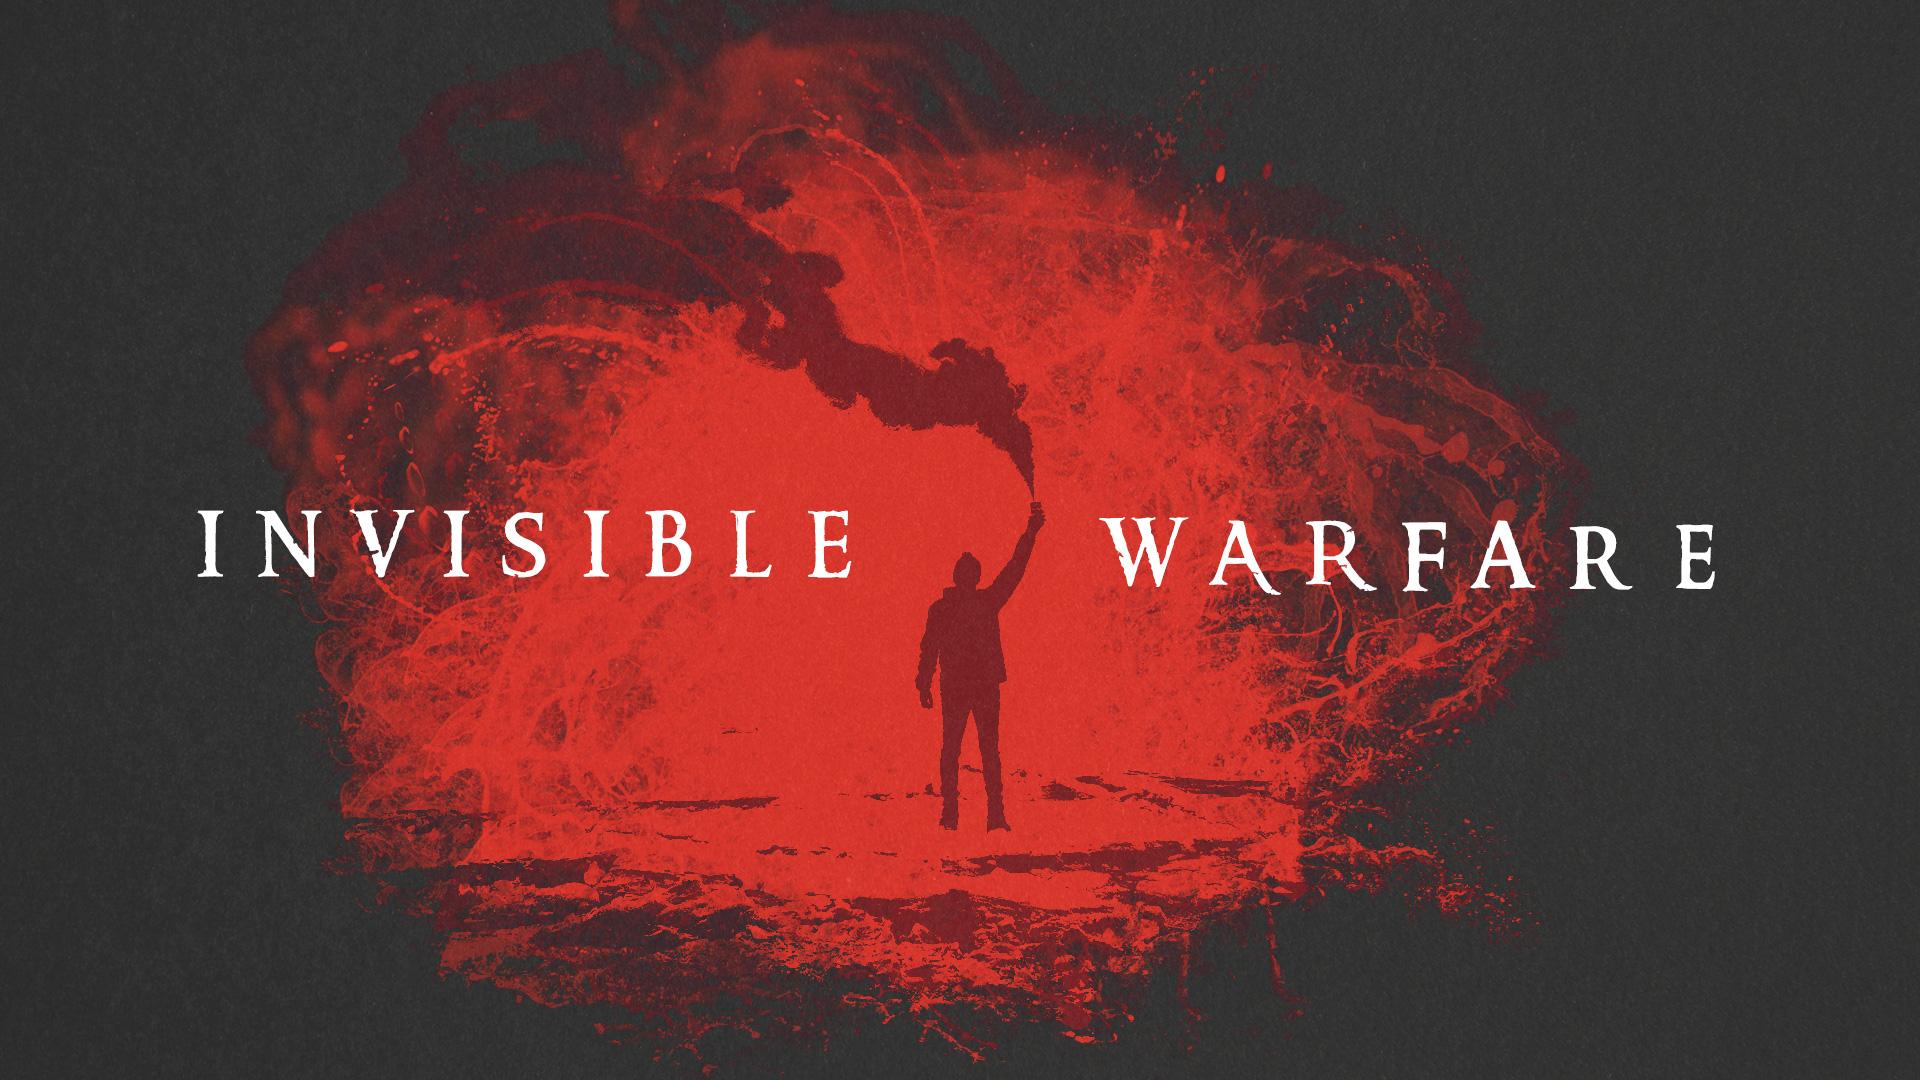 TITLE-InvisibleWarfare.jpg